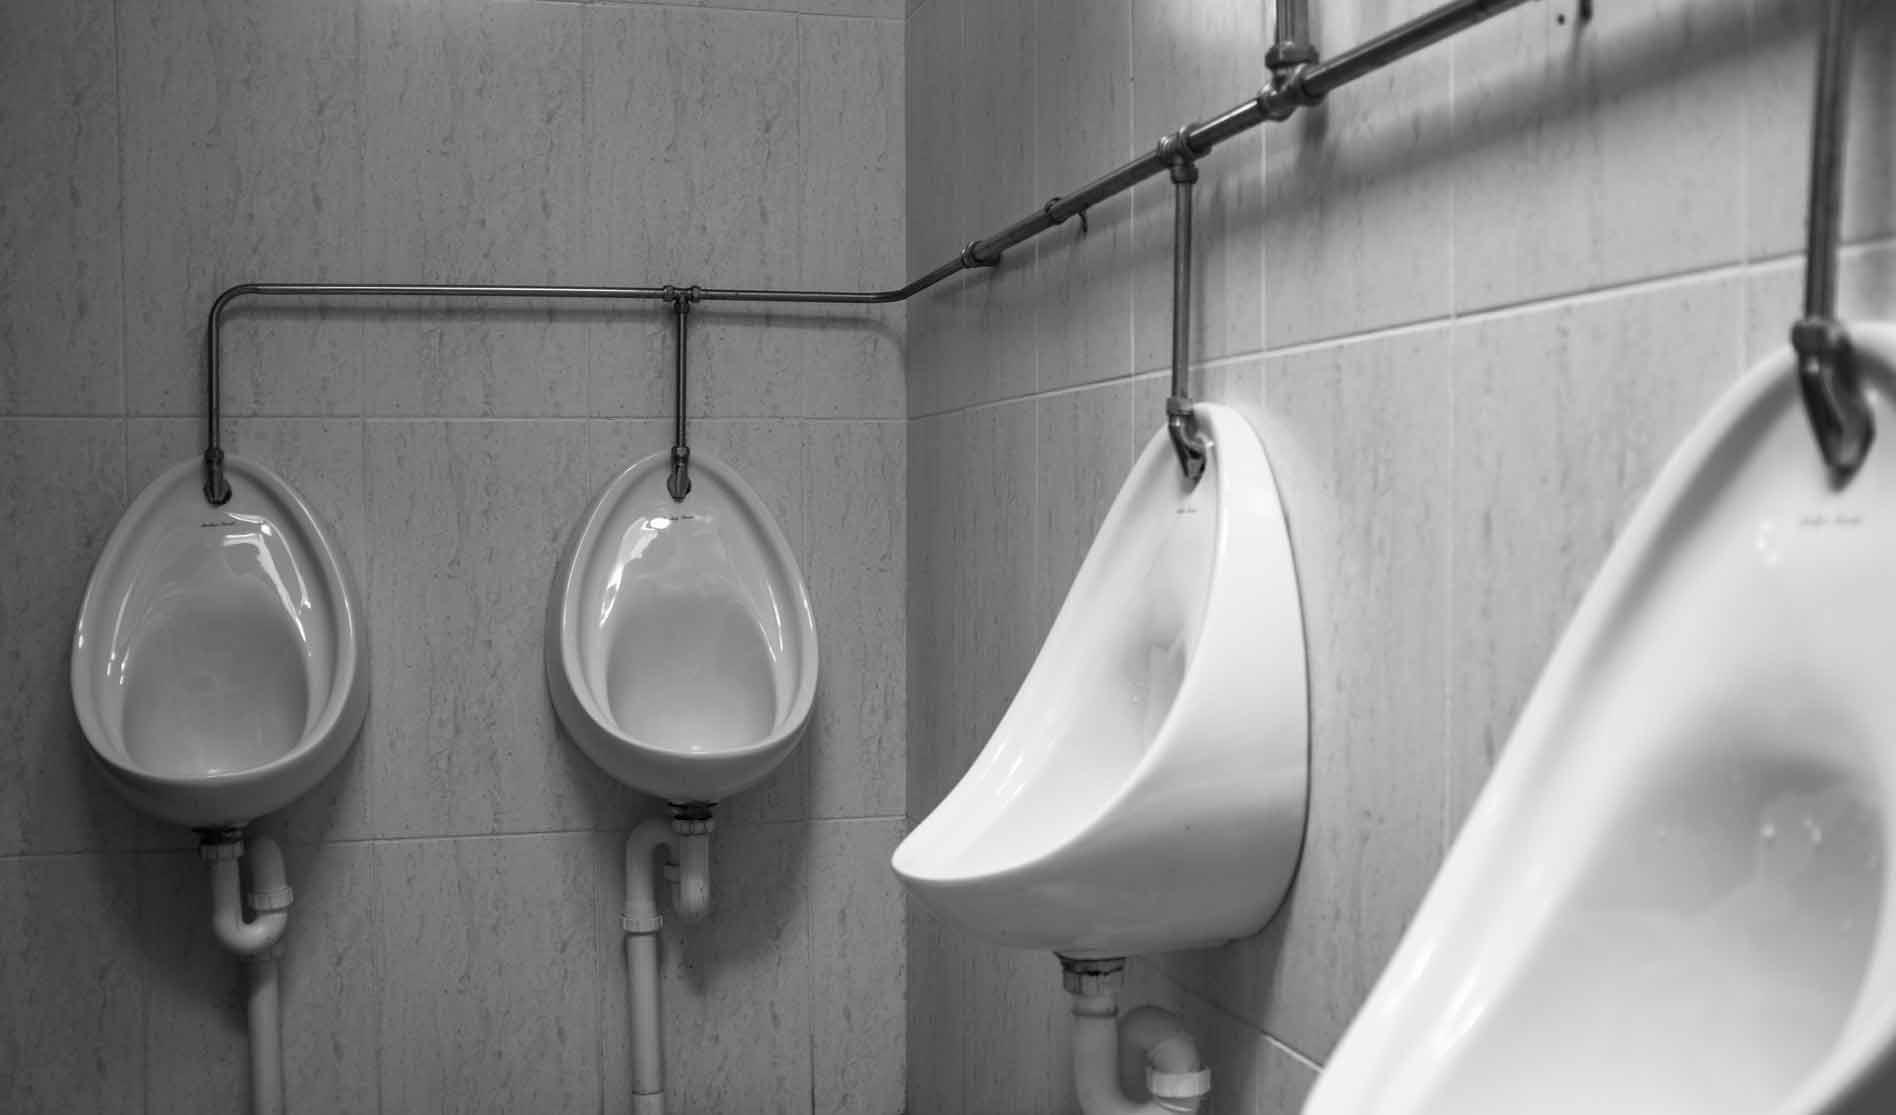 Ask The Batemaster: Restroom Jerk-Off